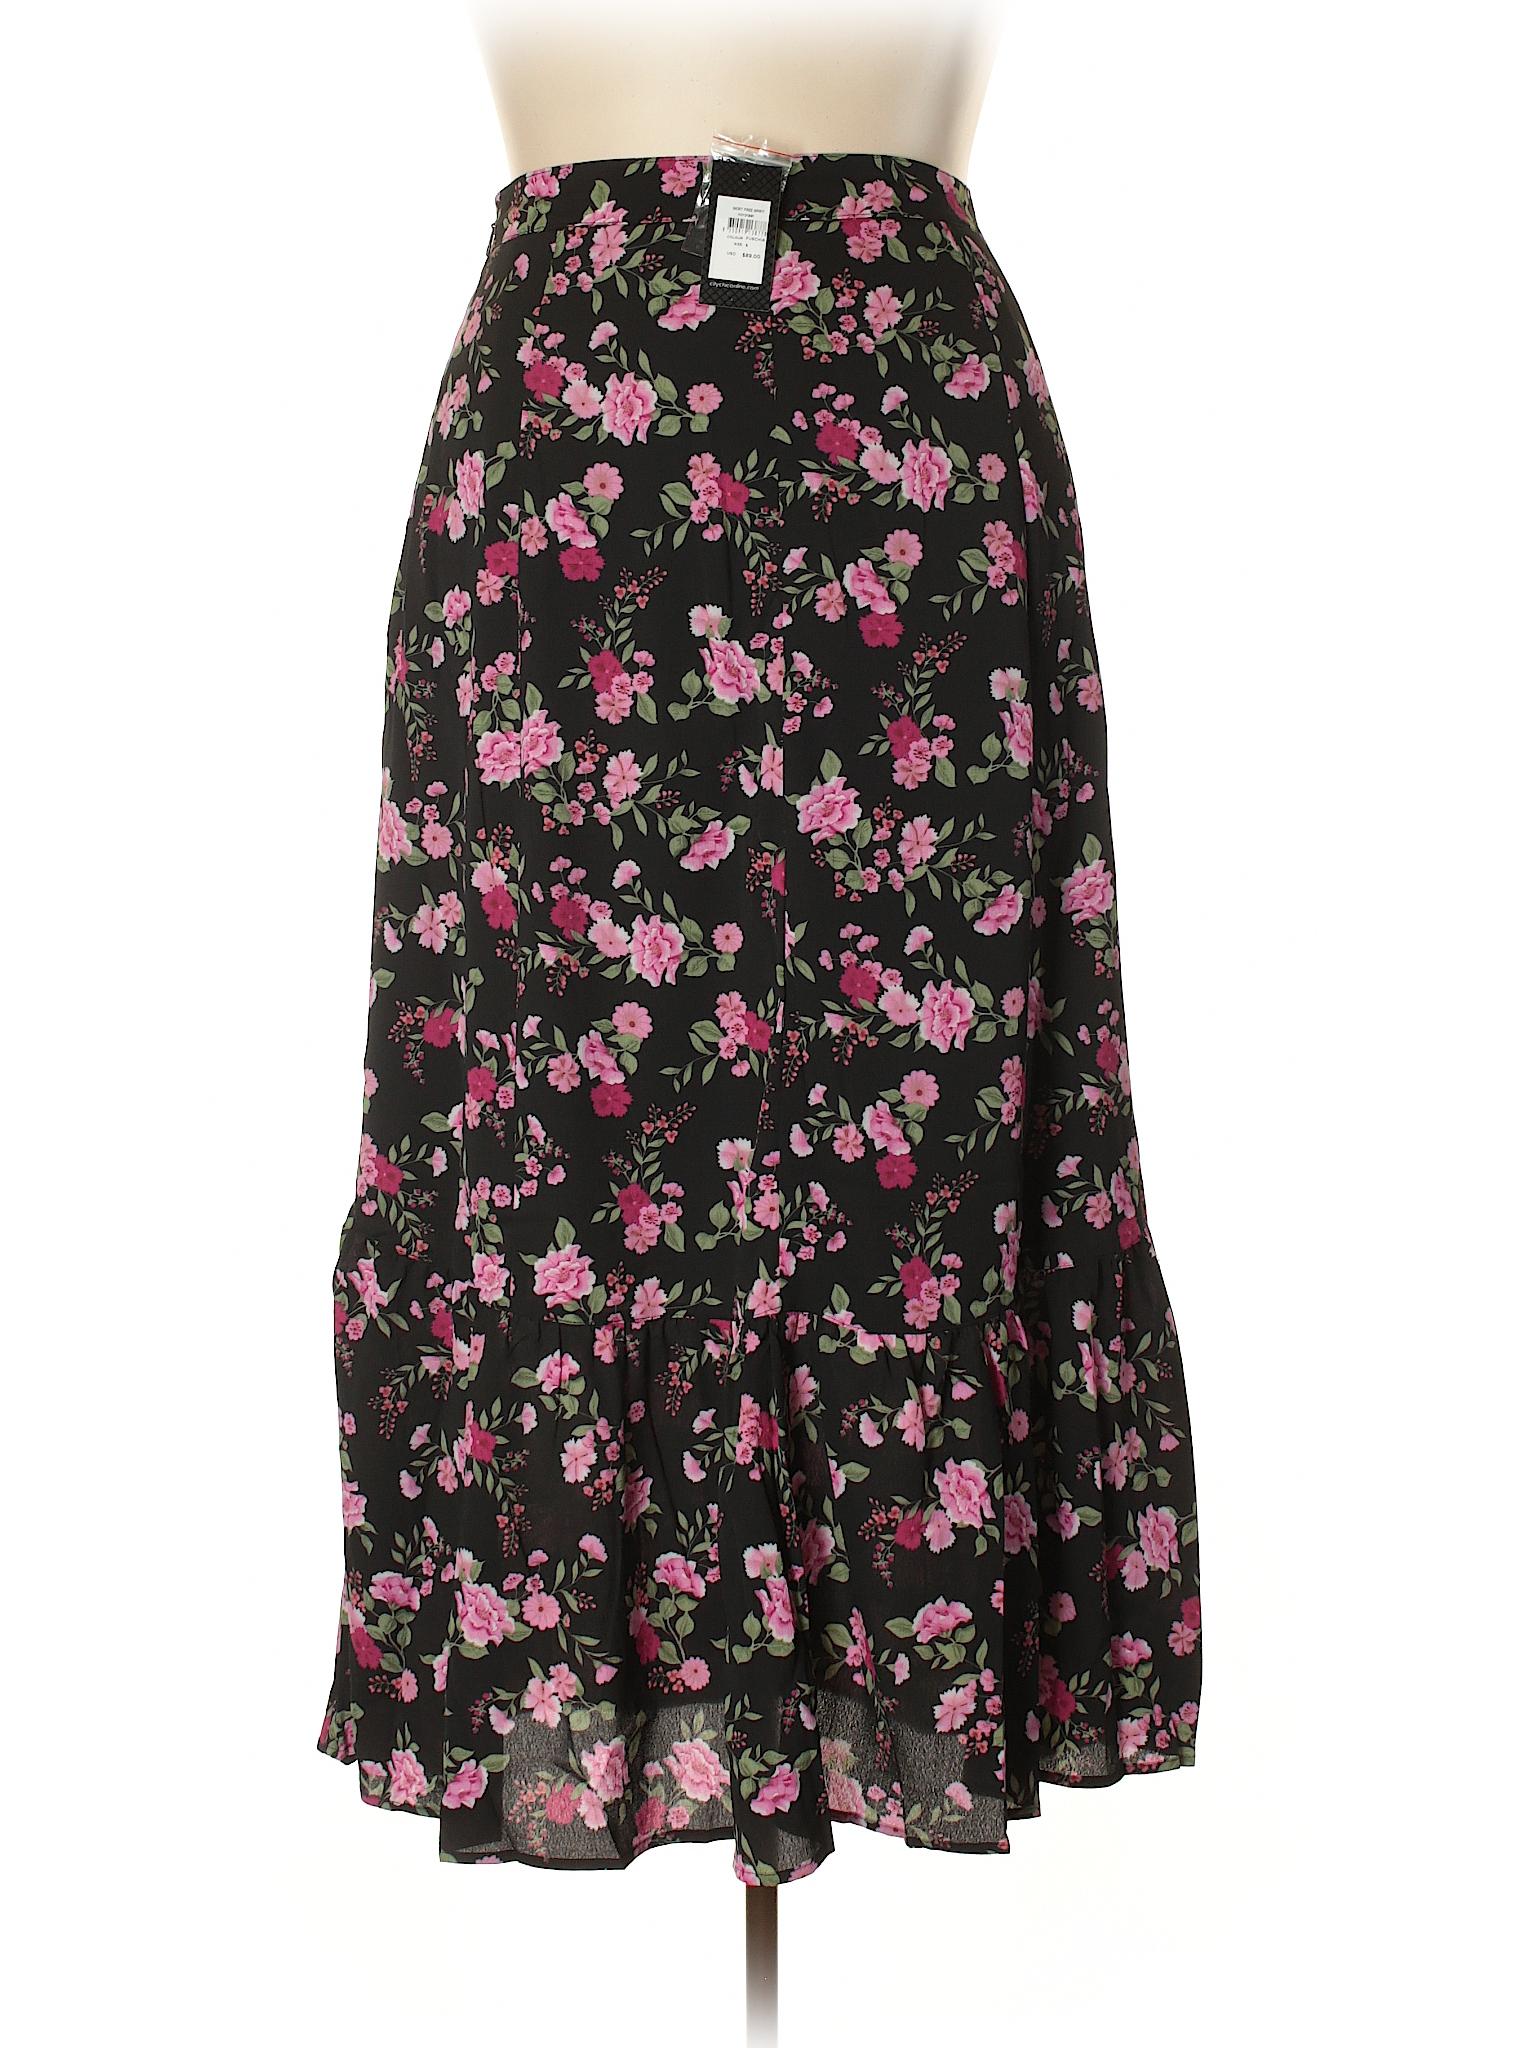 Boutique Casual Boutique Boutique Skirt Boutique Casual Boutique Skirt Casual Casual Skirt Skirt Skirt Casual qnxFBTIwSF